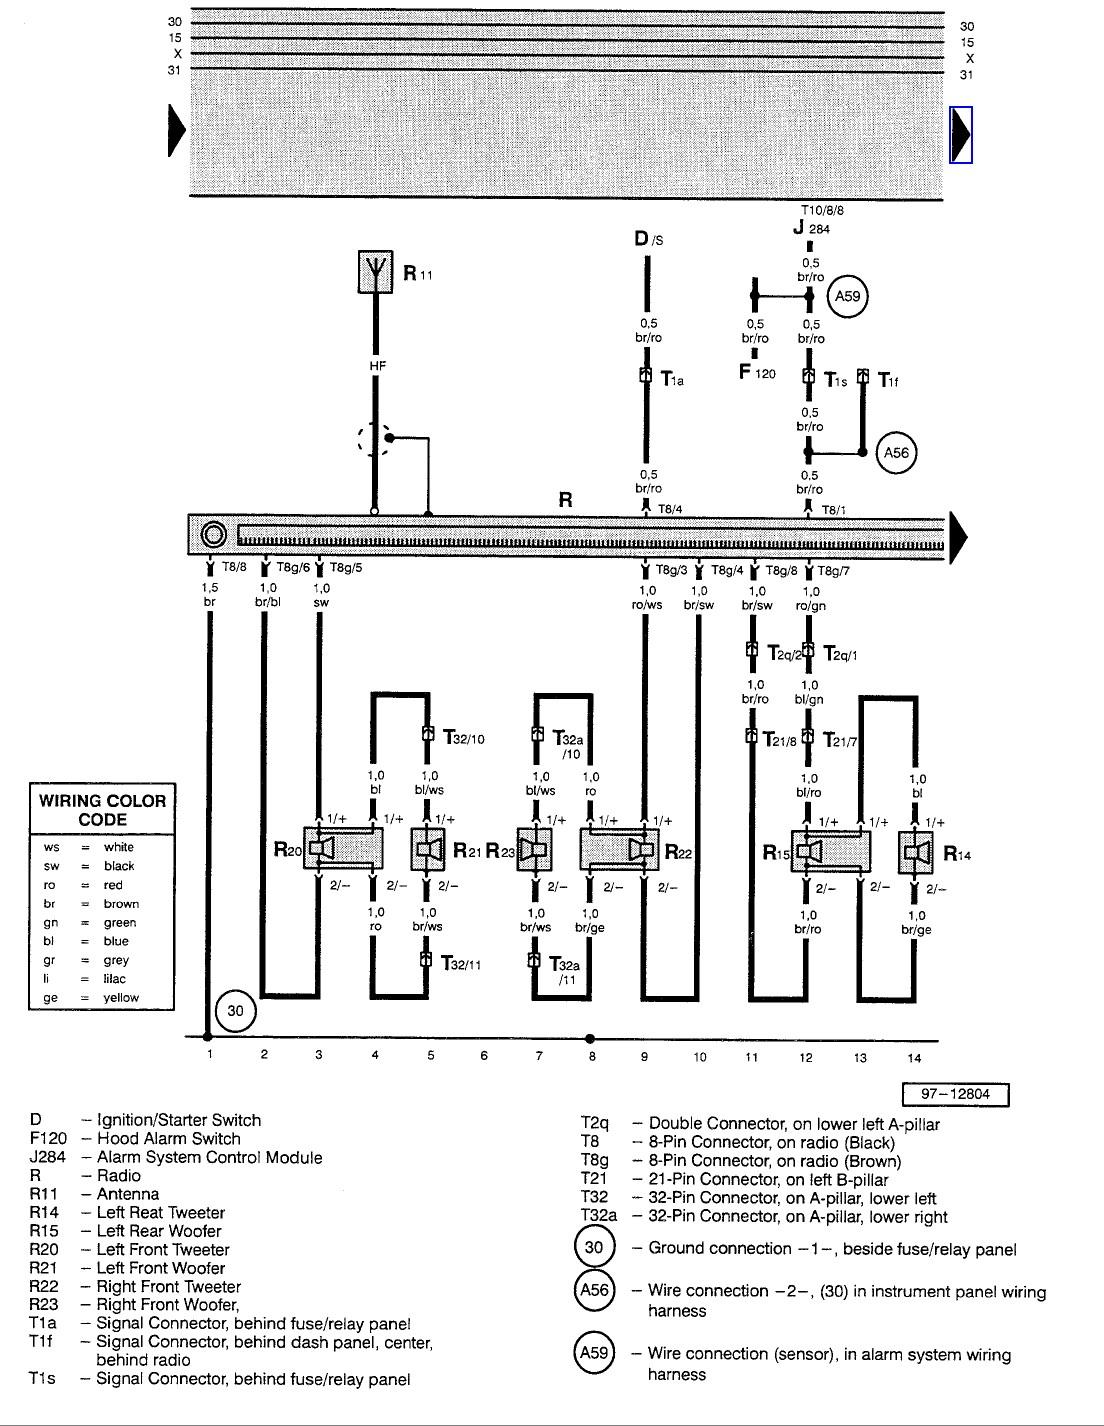 Radio Wiring Diagram Jetta 2002 - Tractor Trailer Electrical Wiring Diagrams  for Wiring Diagram SchematicsWiring Diagram Schematics